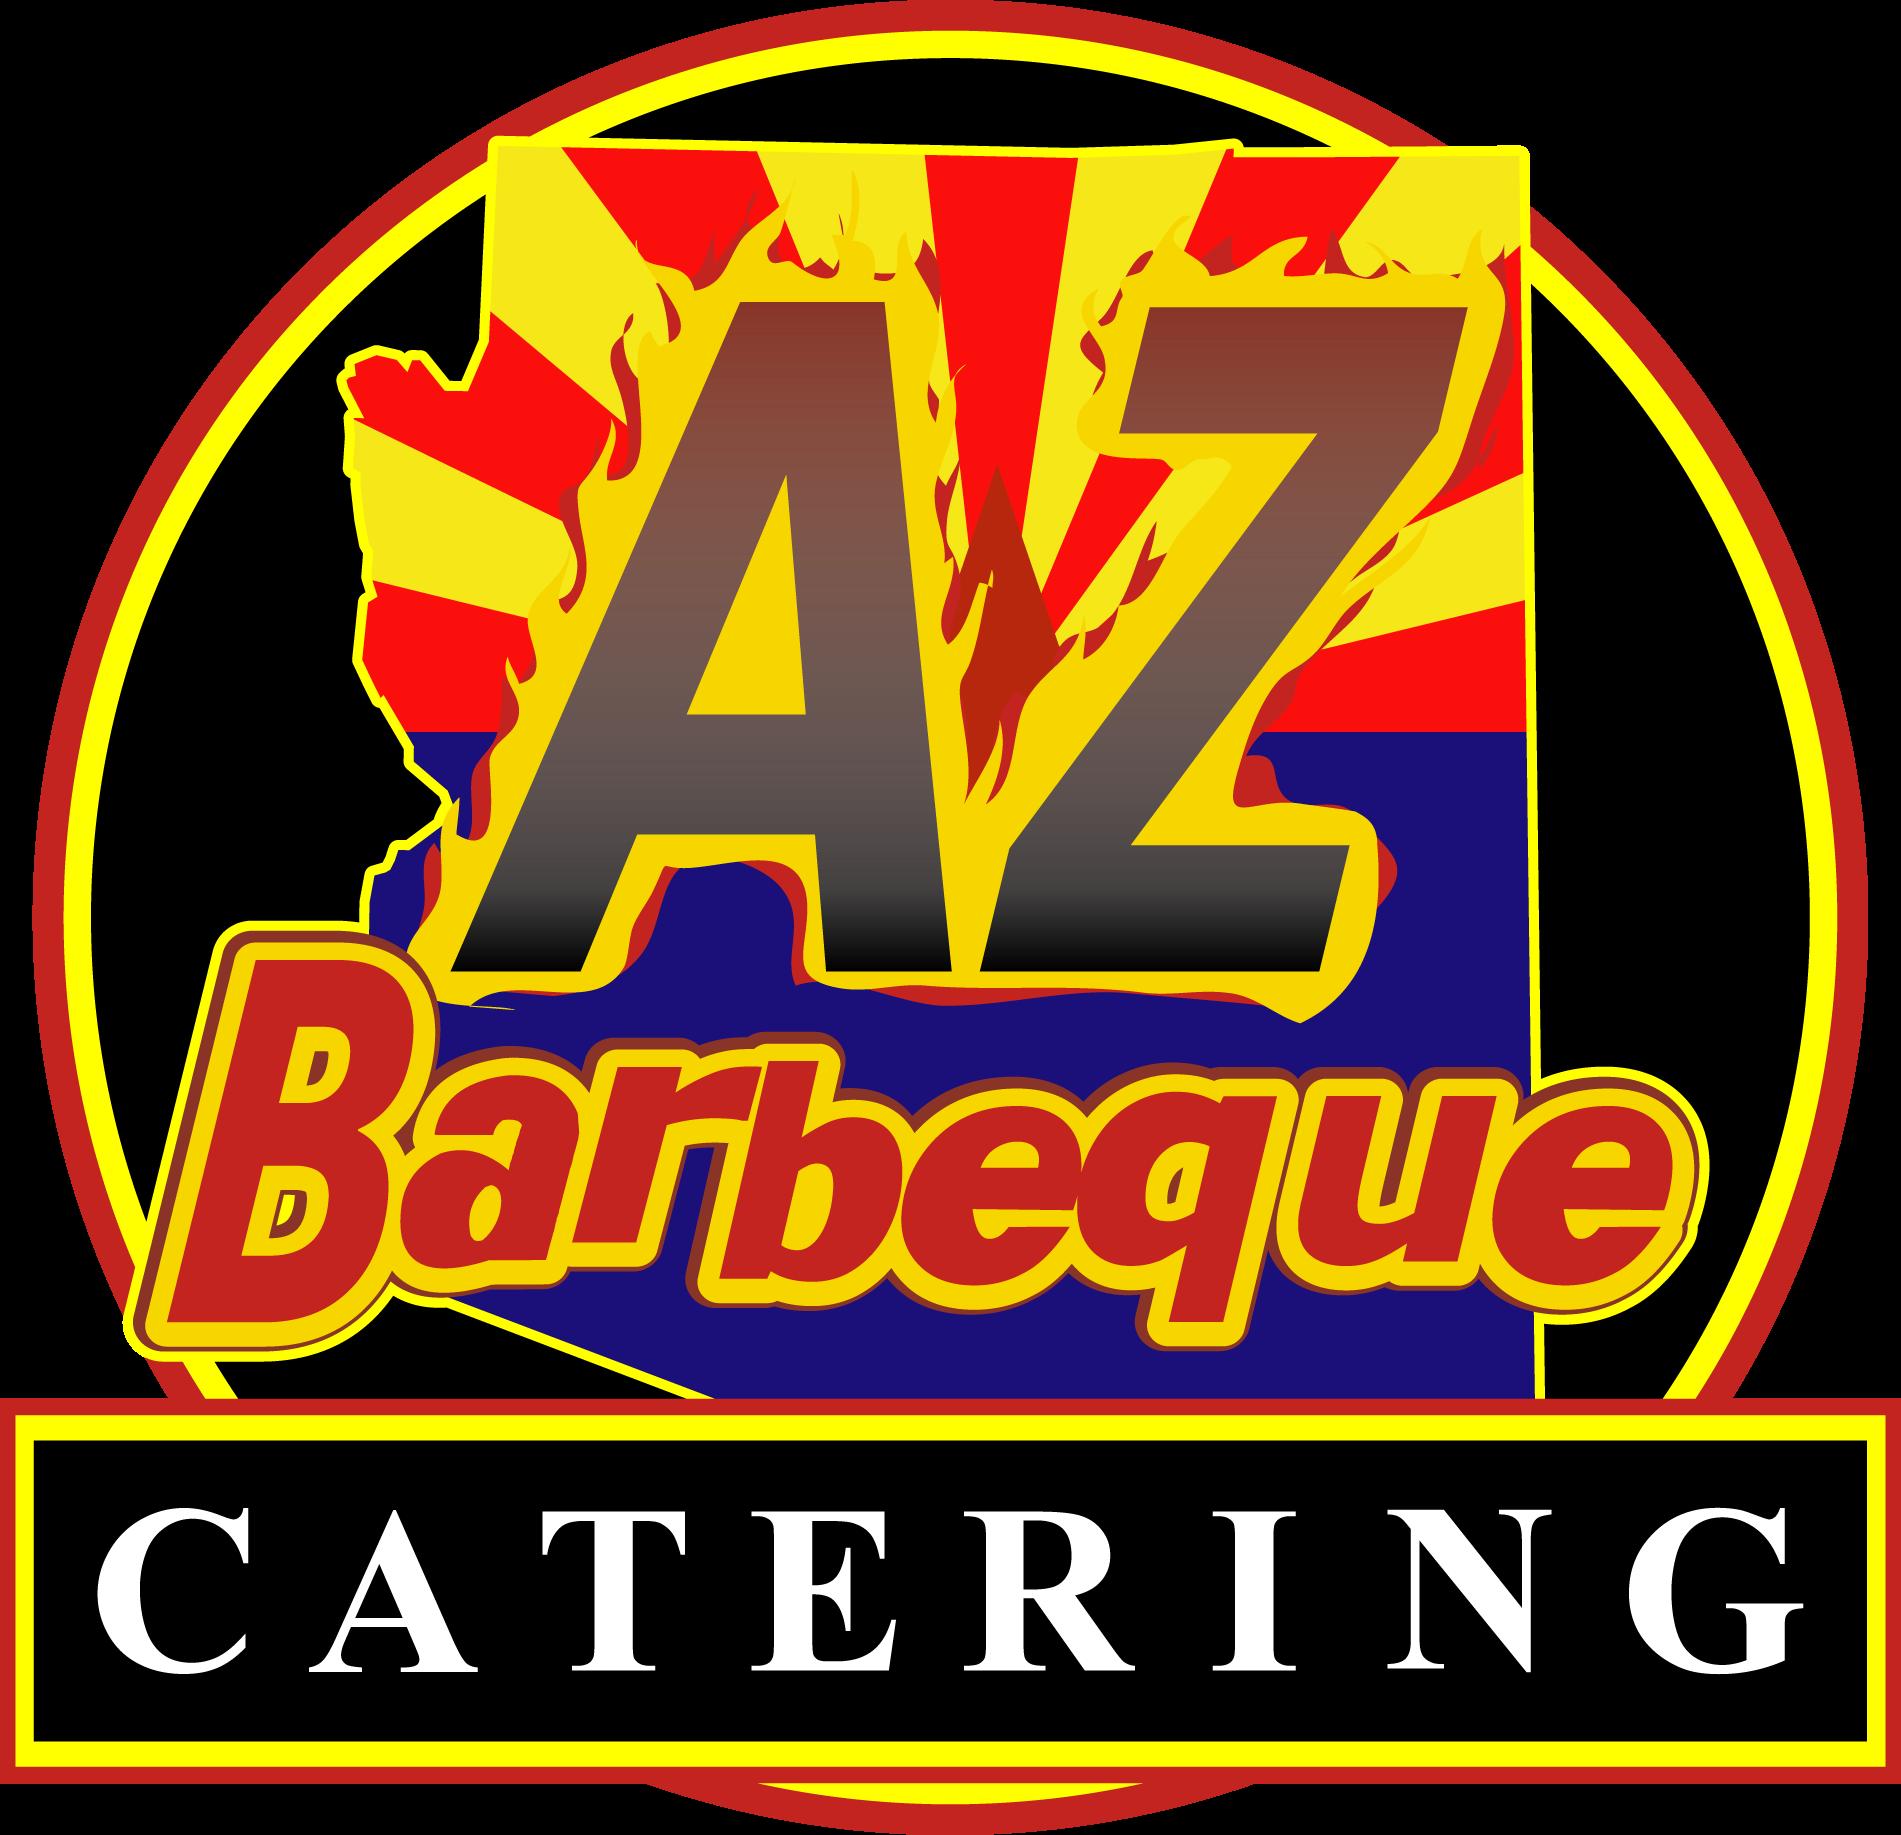 https://birdgangtravel.com/wp-content/uploads/2021/10/AZ-BBQ-LOGO-CATERING.png